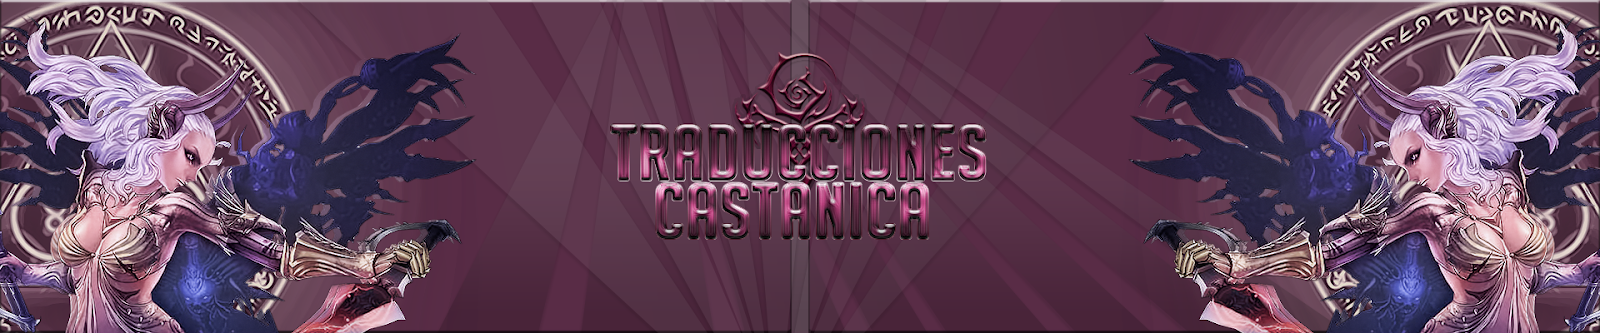 Traducciones Castanica